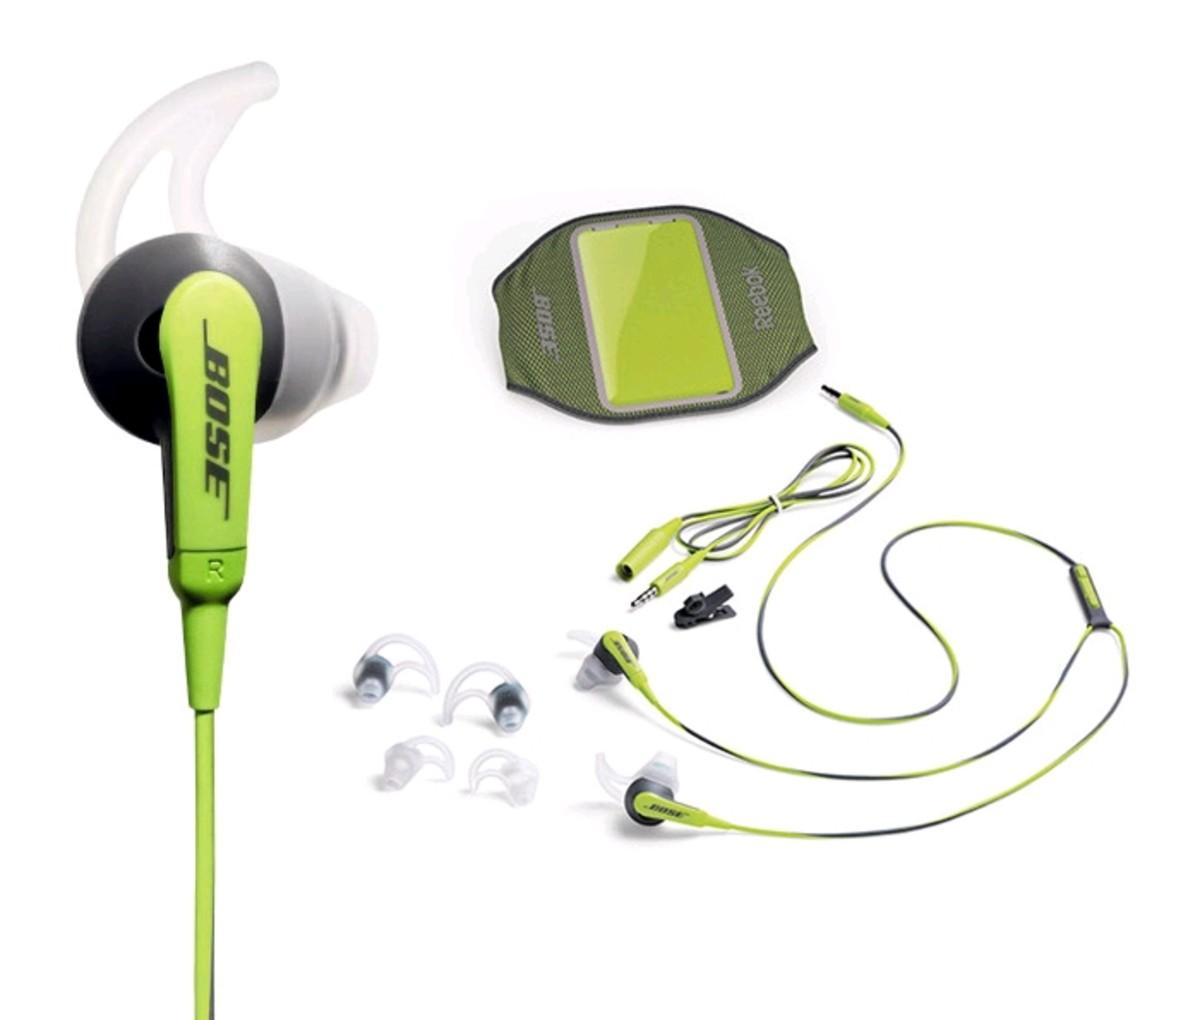 Bose SIE2i Sport Headset